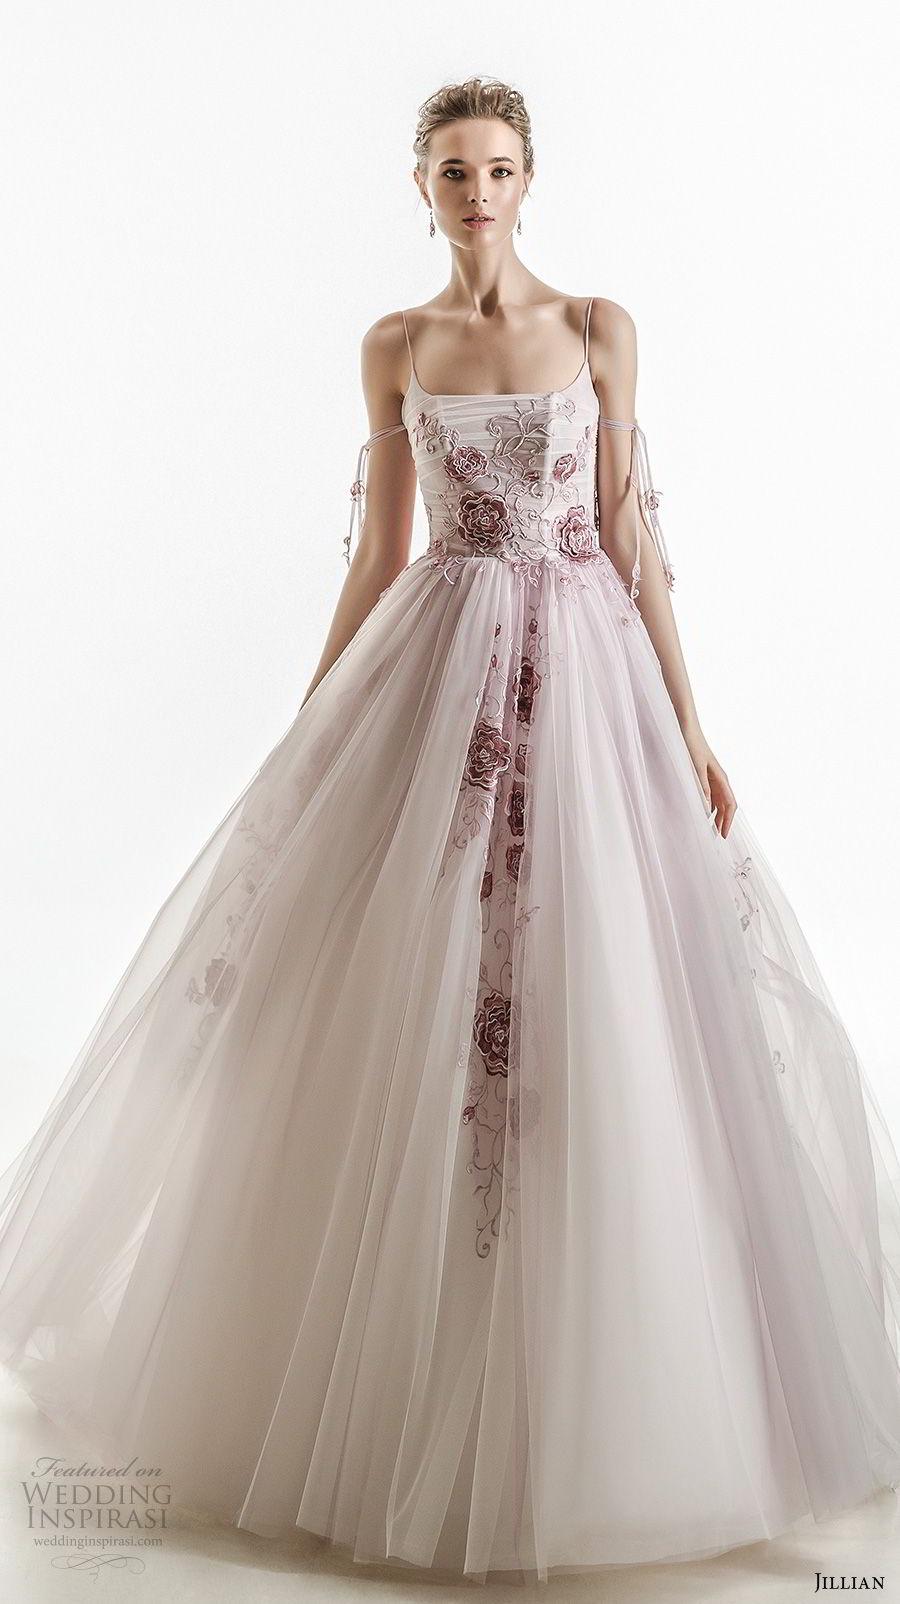 jillian 2018 bridal spagetti strap straight across neckline heavily embellished bodice tulle skirt romantic purple color wedding dress (30) mv